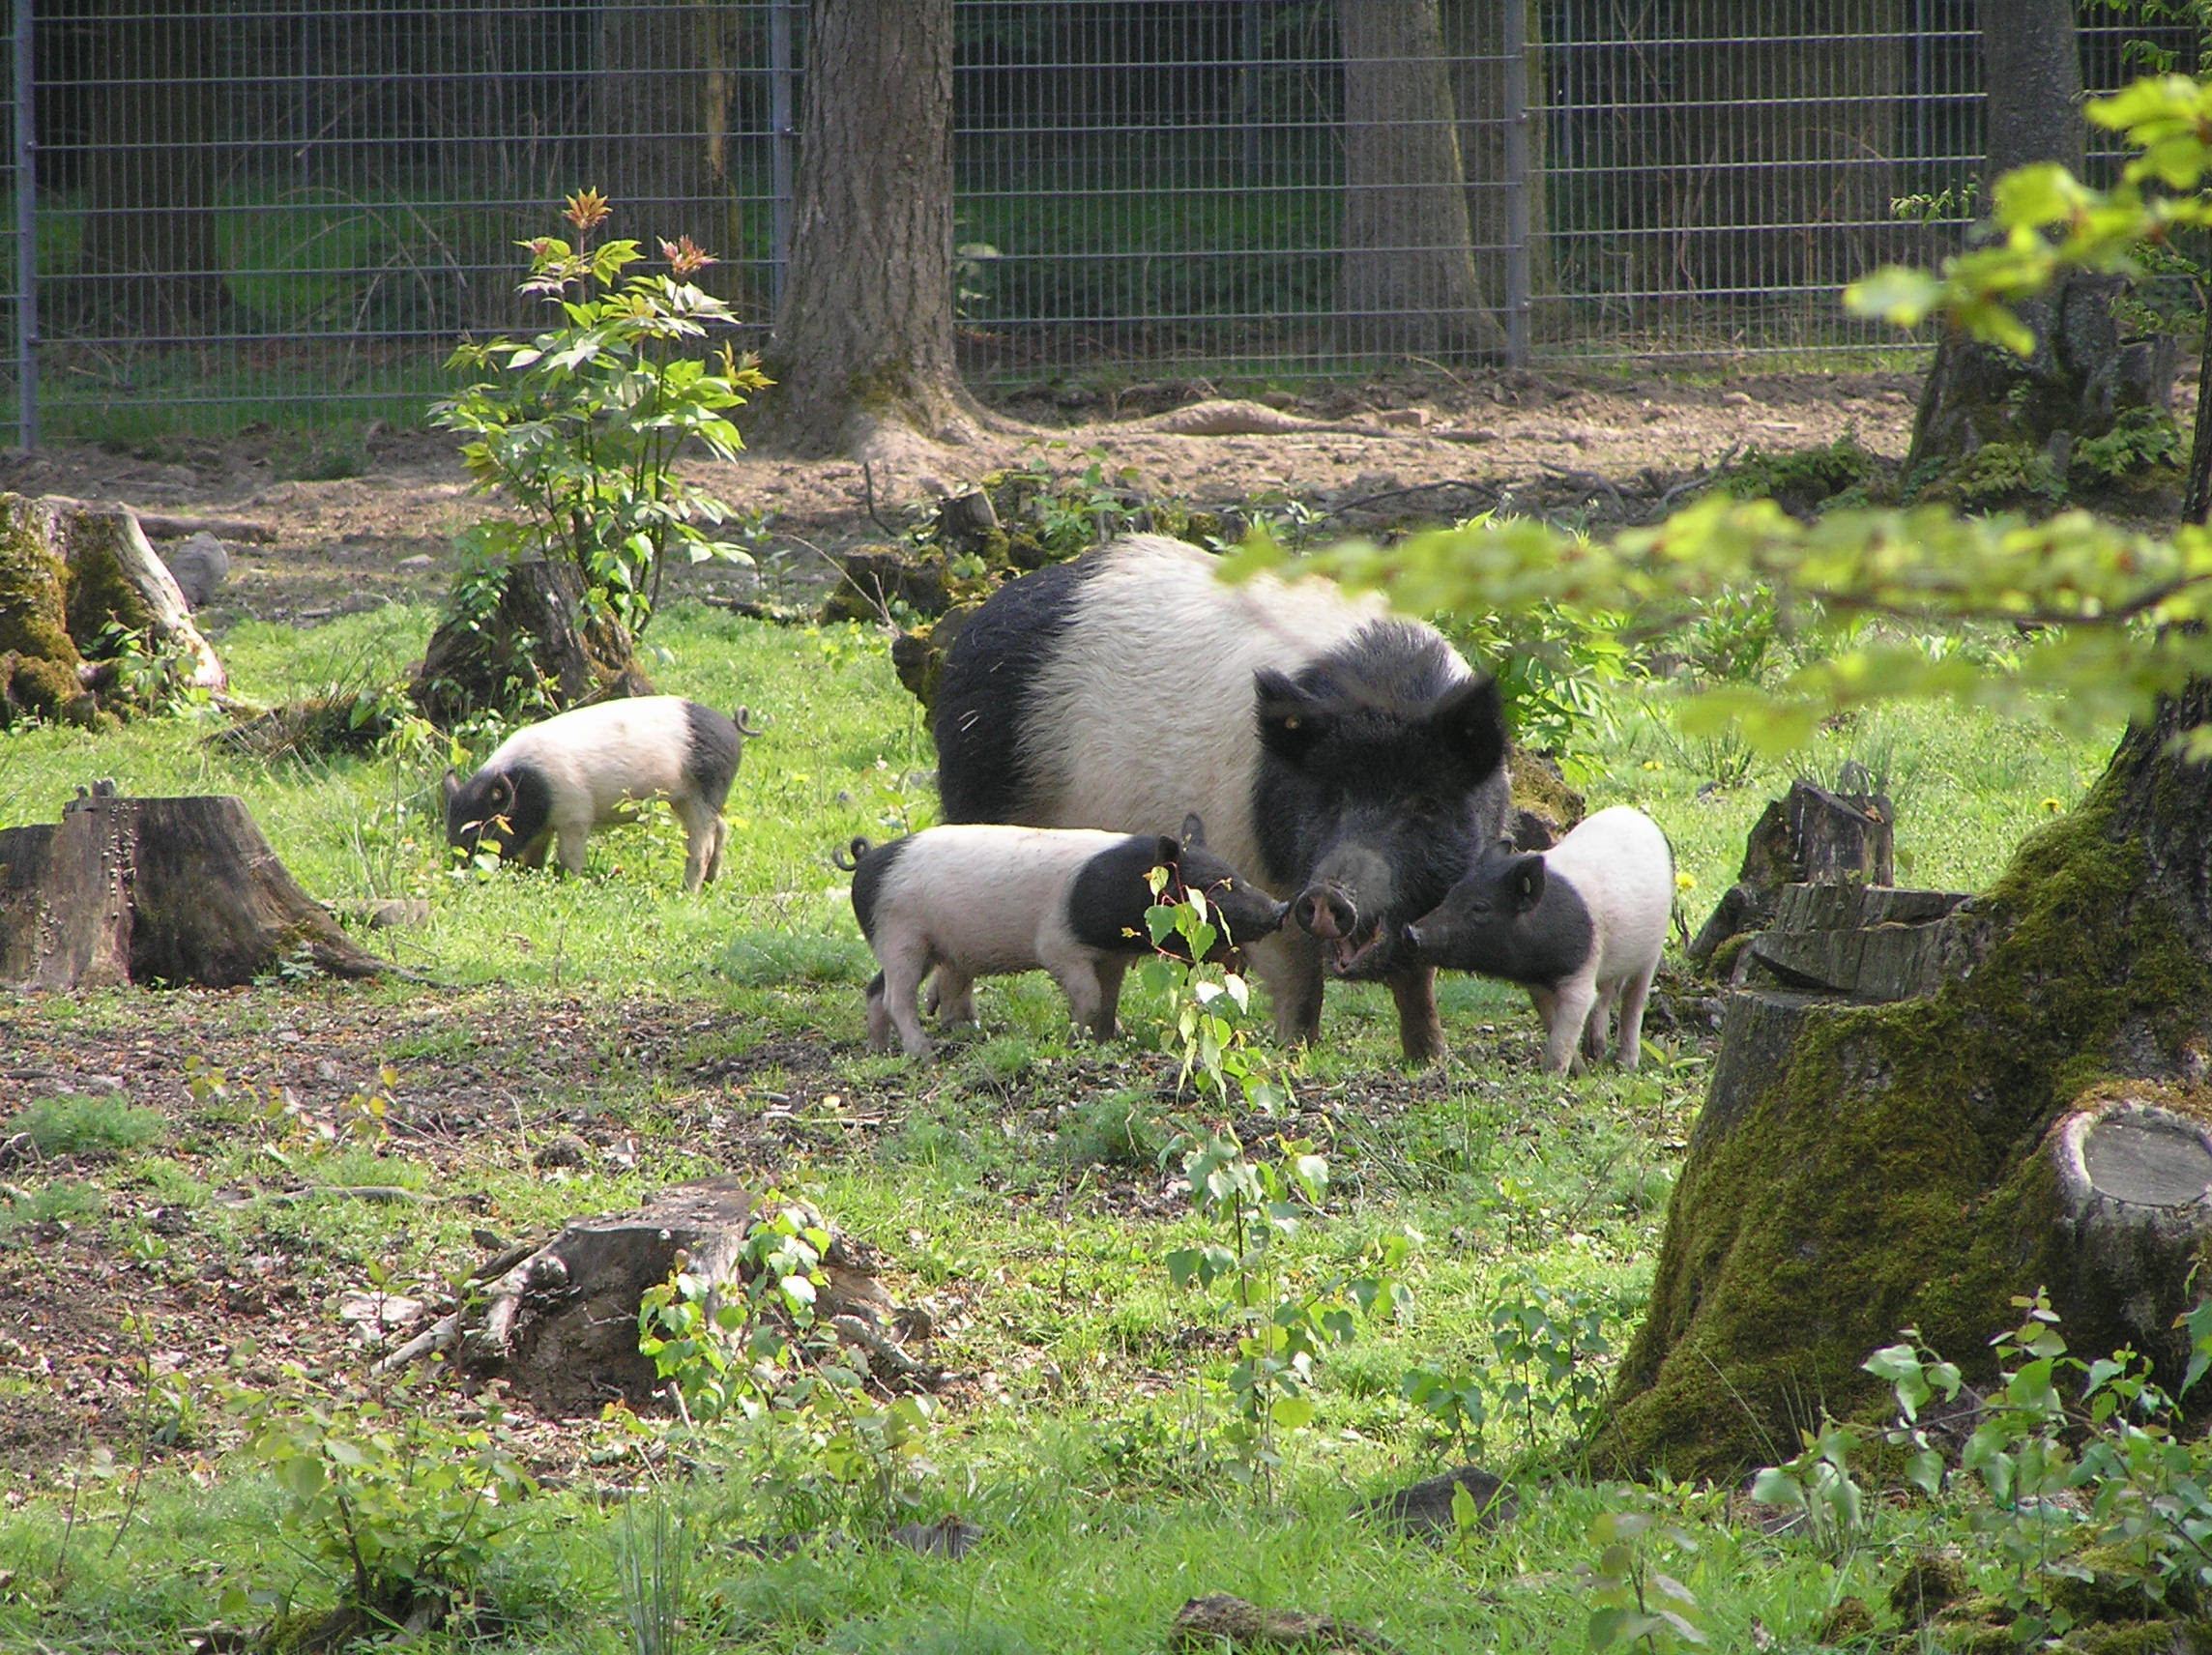 http://upload.wikimedia.org/wikipedia/commons/b/b8/Hessenpark_Waldweide.JPG